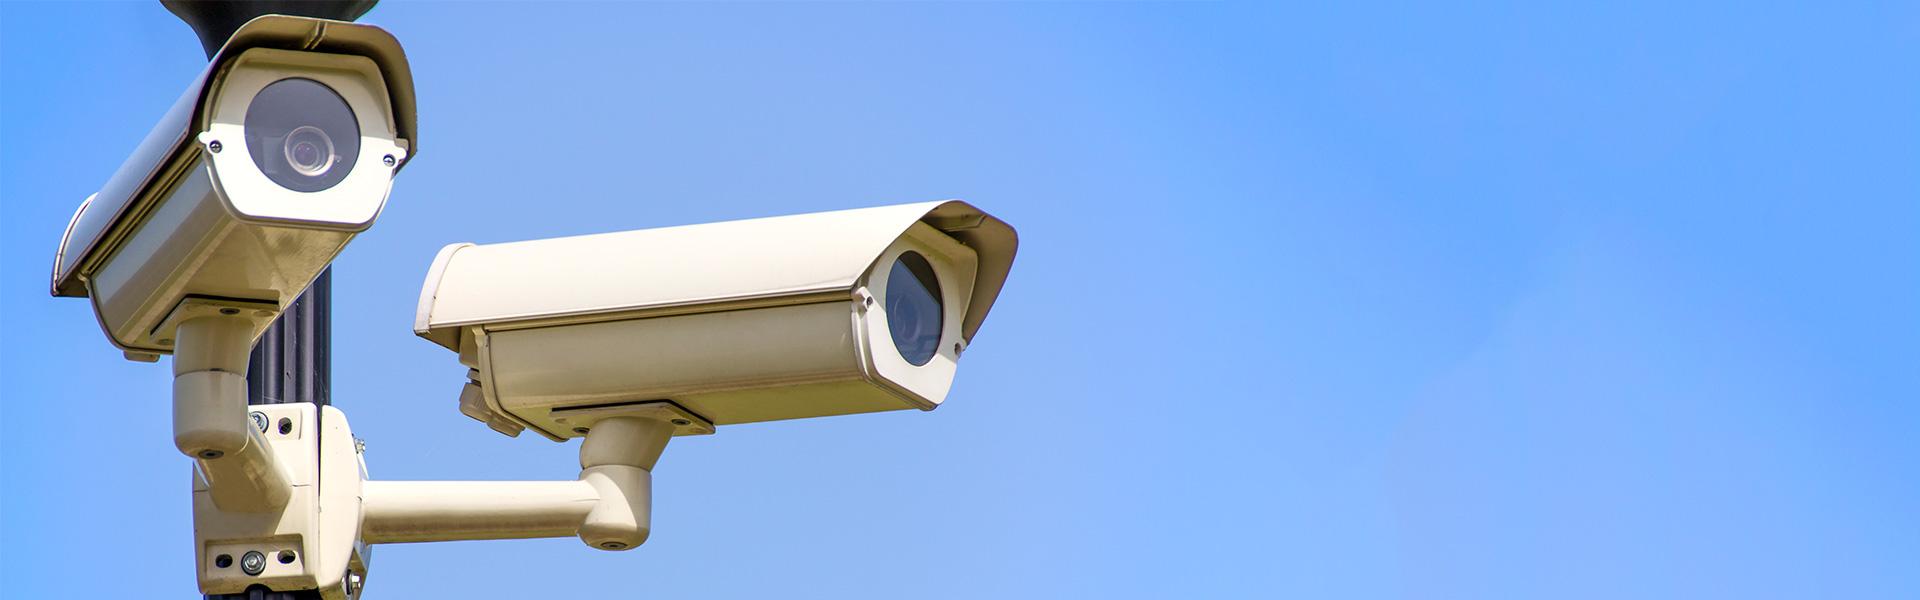 Camera greenlight security green light security aloadofball Gallery